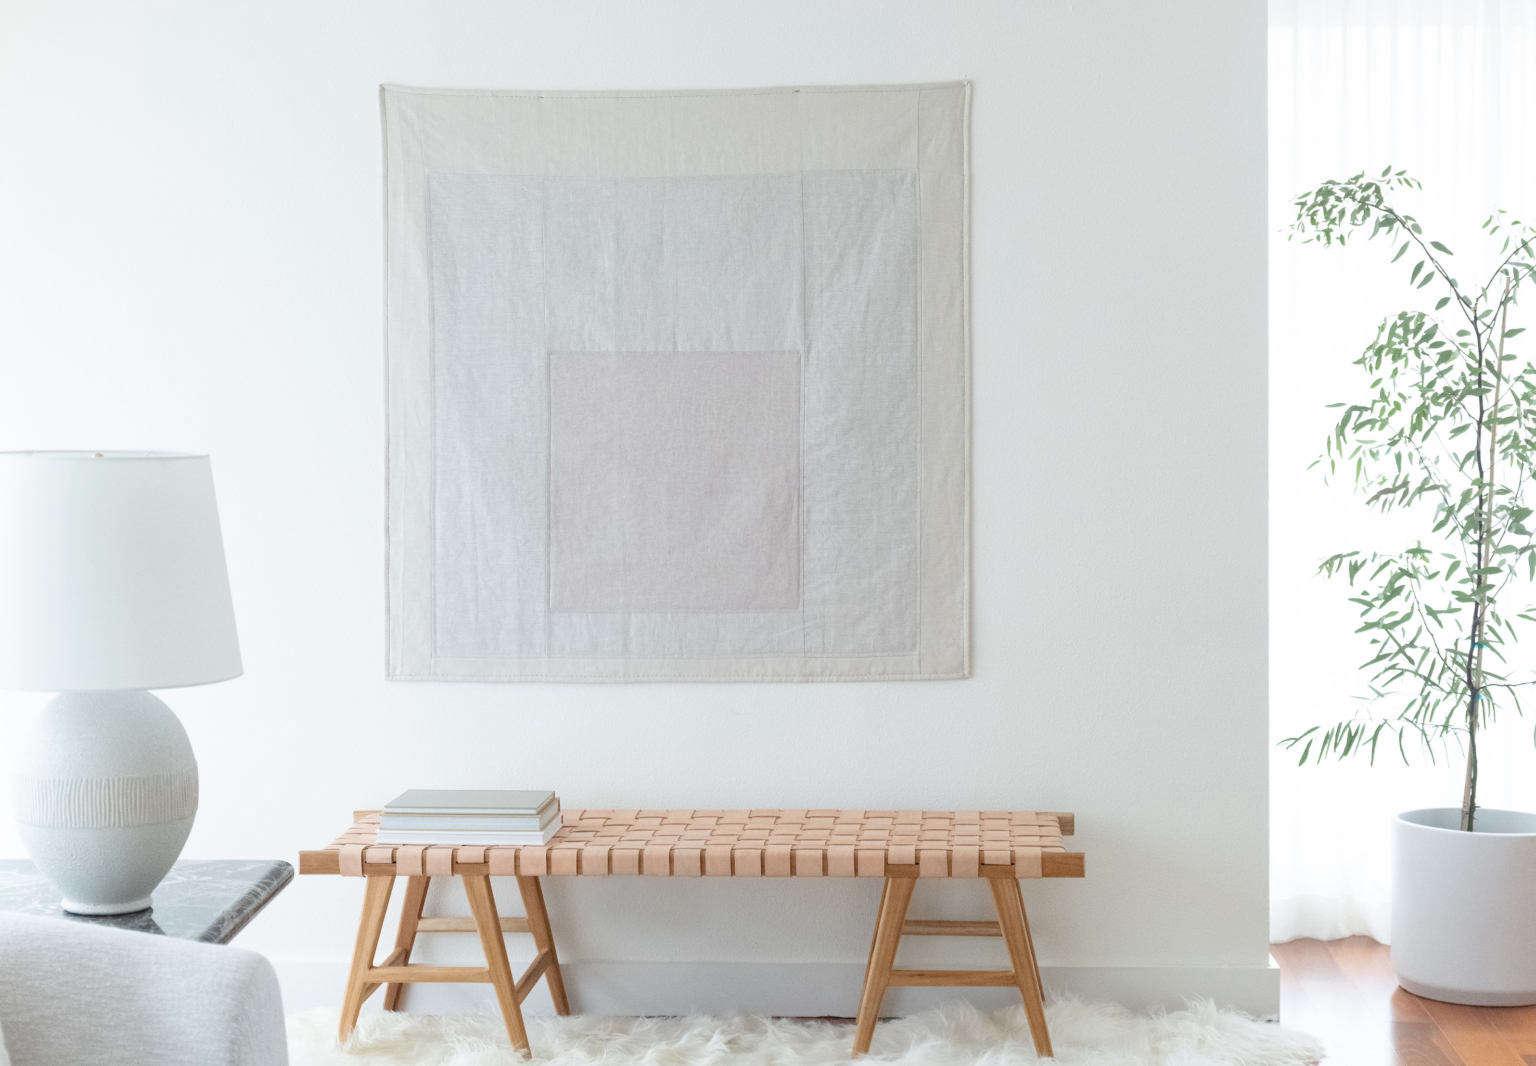 lisa staton design josef albers inspired minimalist quilt first hill condo seattle 1 2 1536x1066